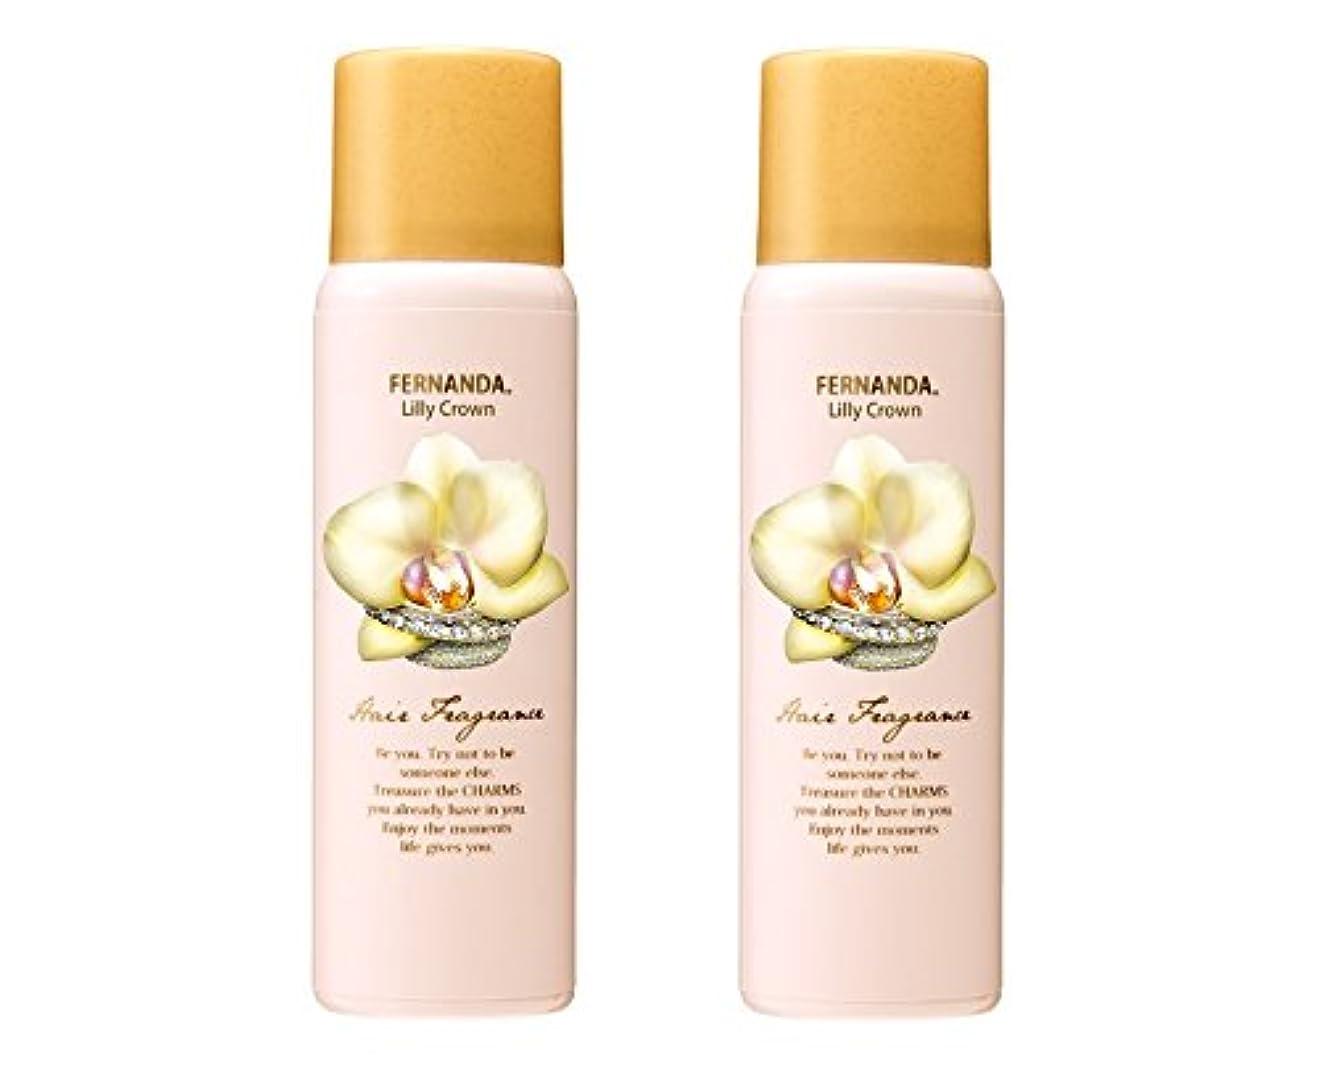 FERNANDA(フェルナンダ) Hair Fragrance Lilly Crown (ヘアー フレグランス リリークラウン)×2個セット